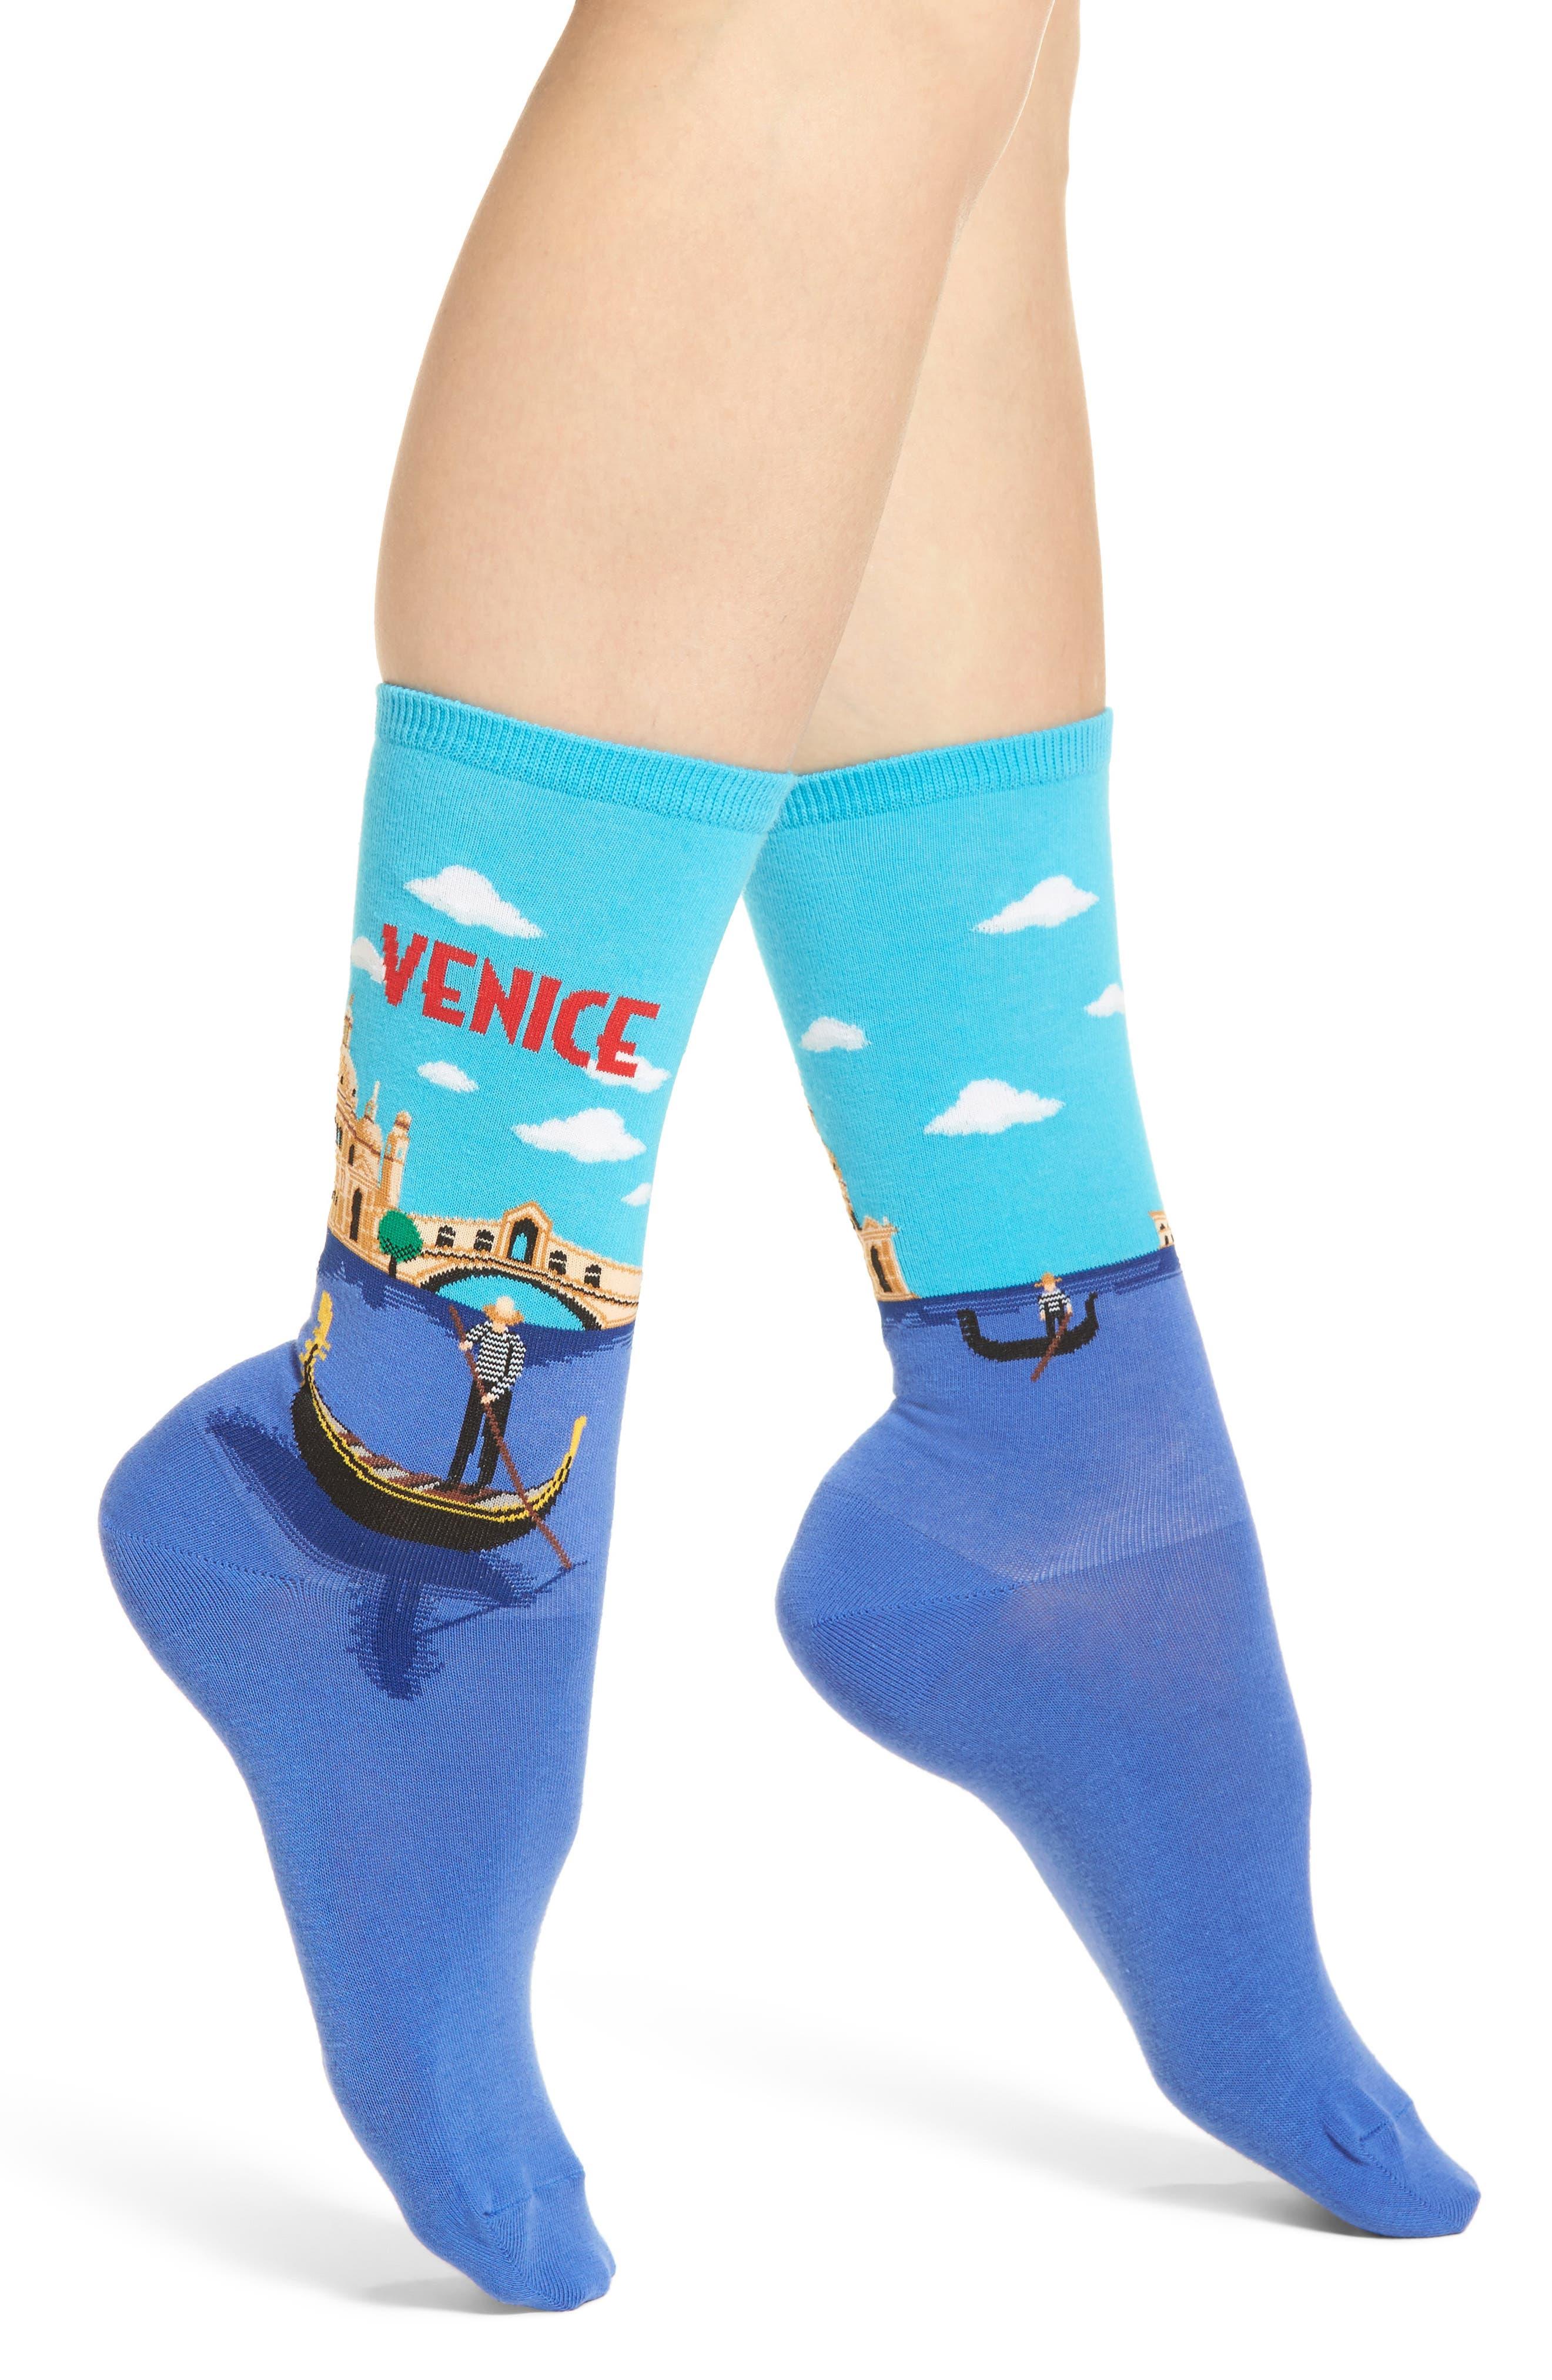 Hot Sox Travel Series - Venice Crew Socks (3 for $15)